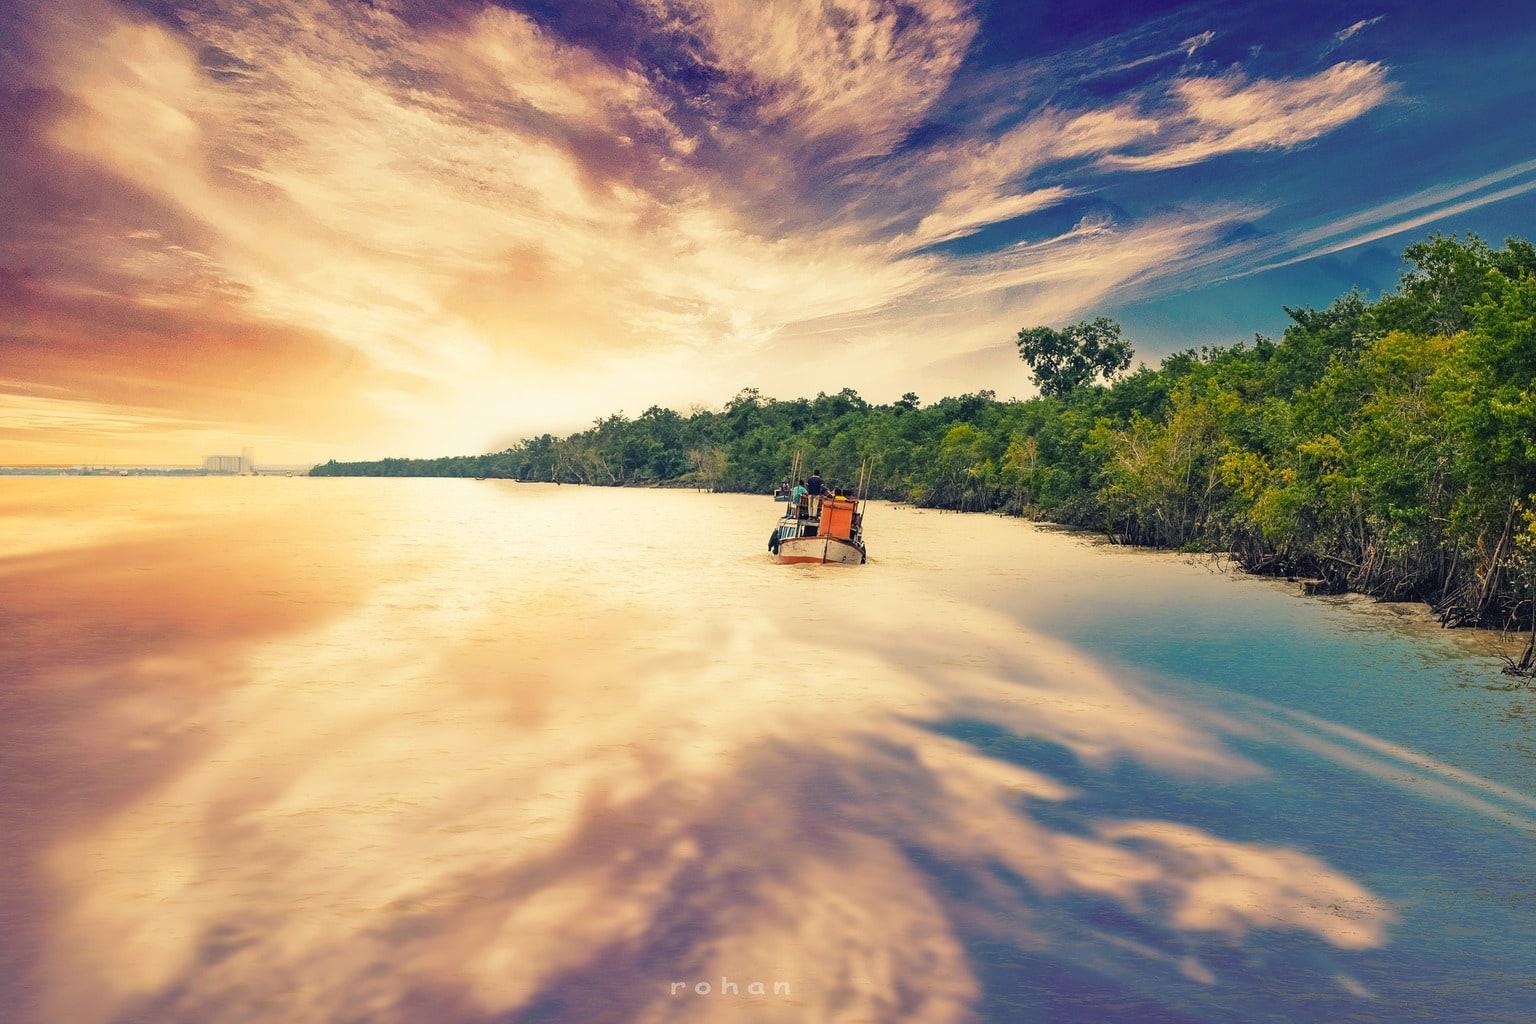 Sundarbans ecosystem